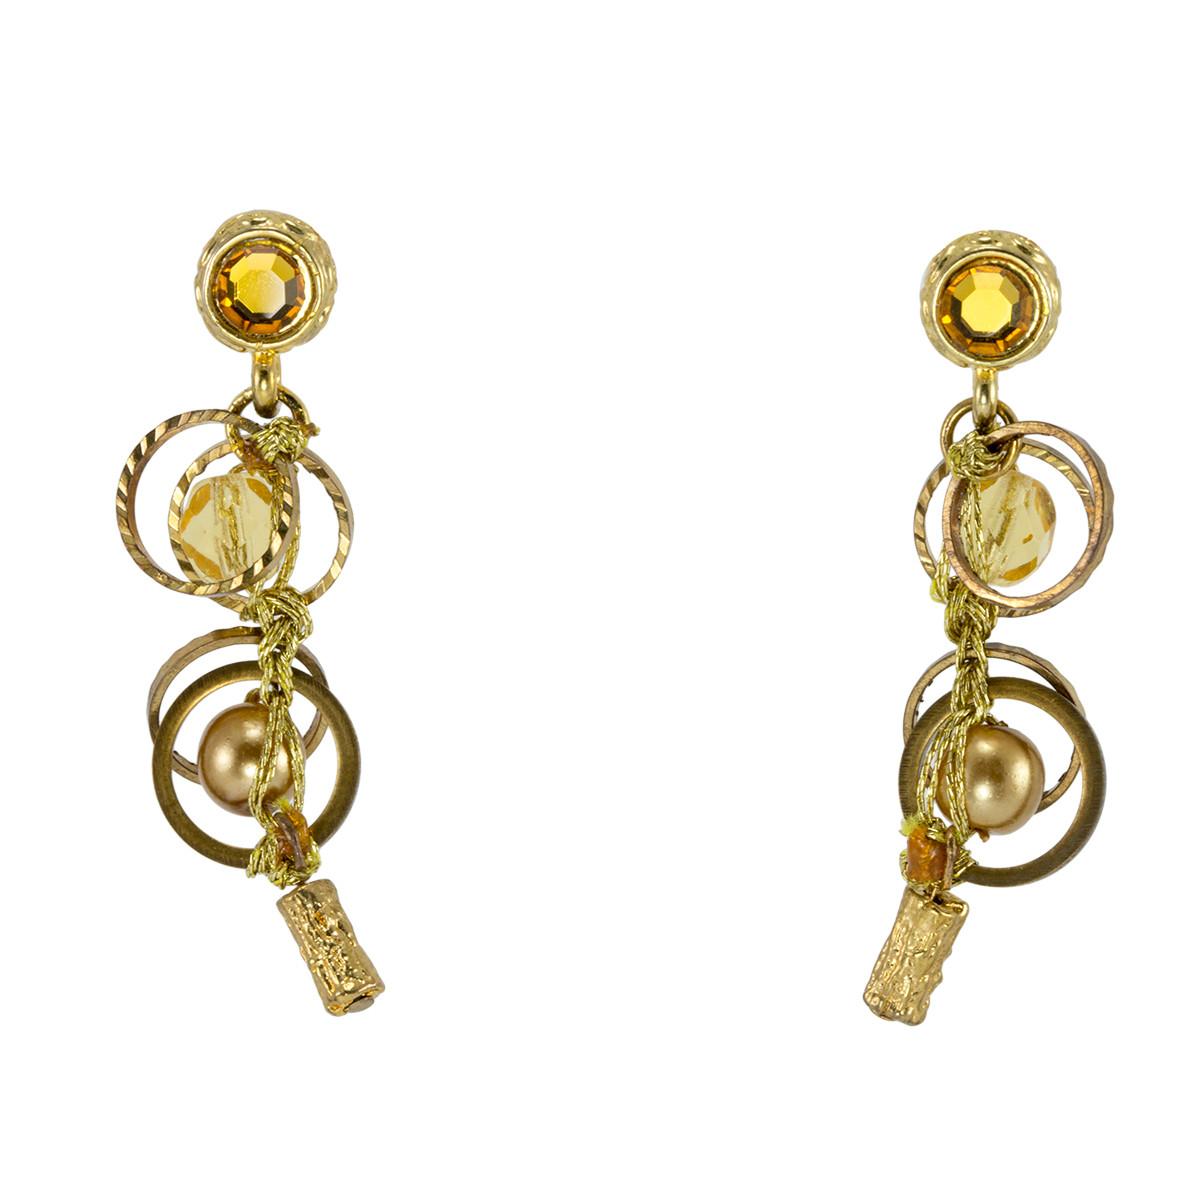 Anat Jewelry Golden Brillance Earrings